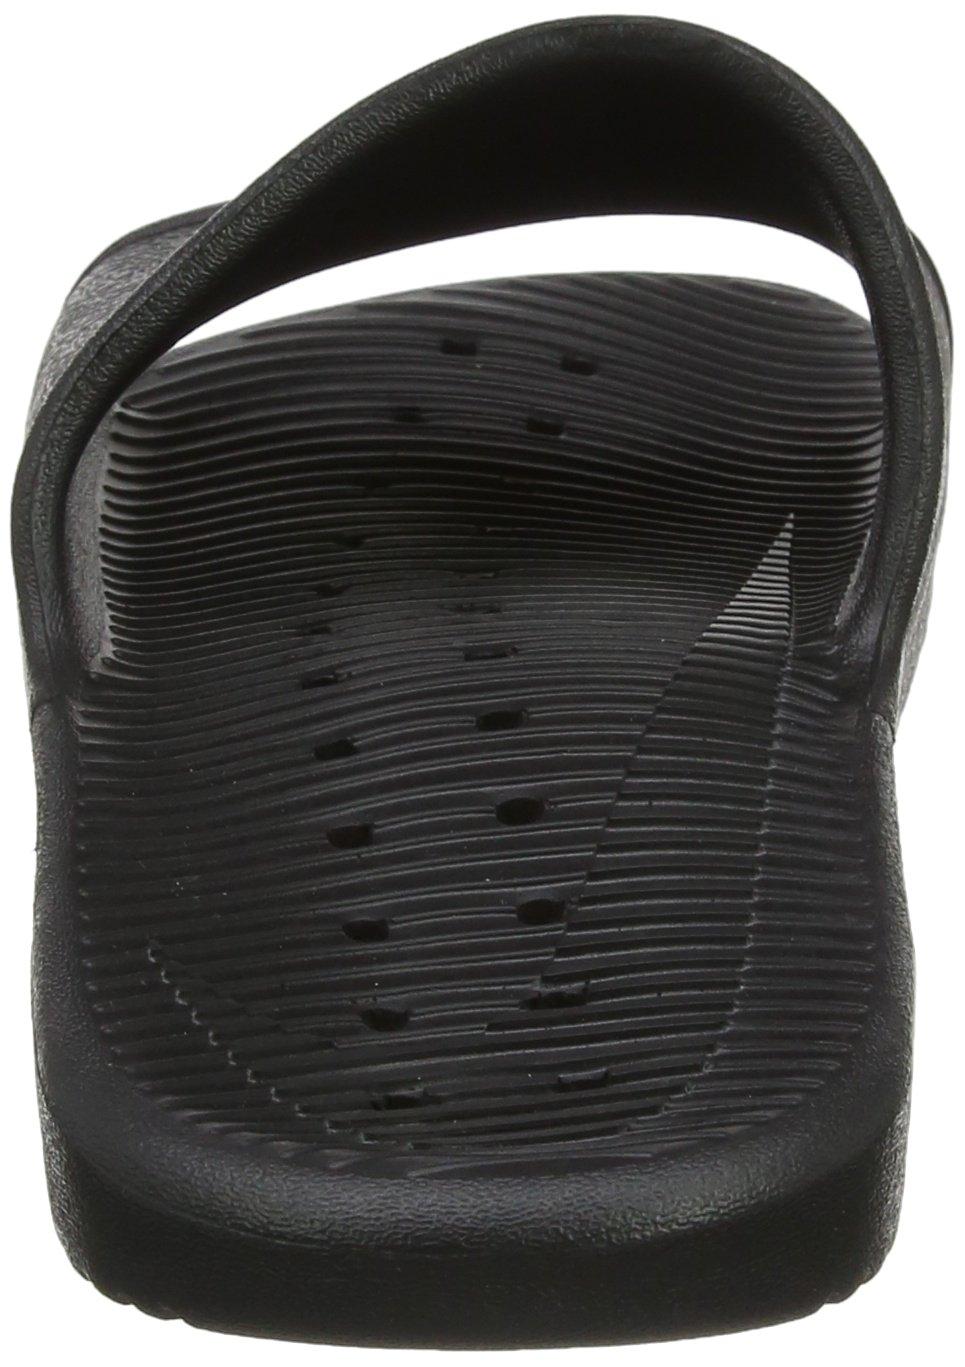 NIKE Women's Kawa Shower Slide Sandals B01F490WLI 11 B(M) US|Black/White